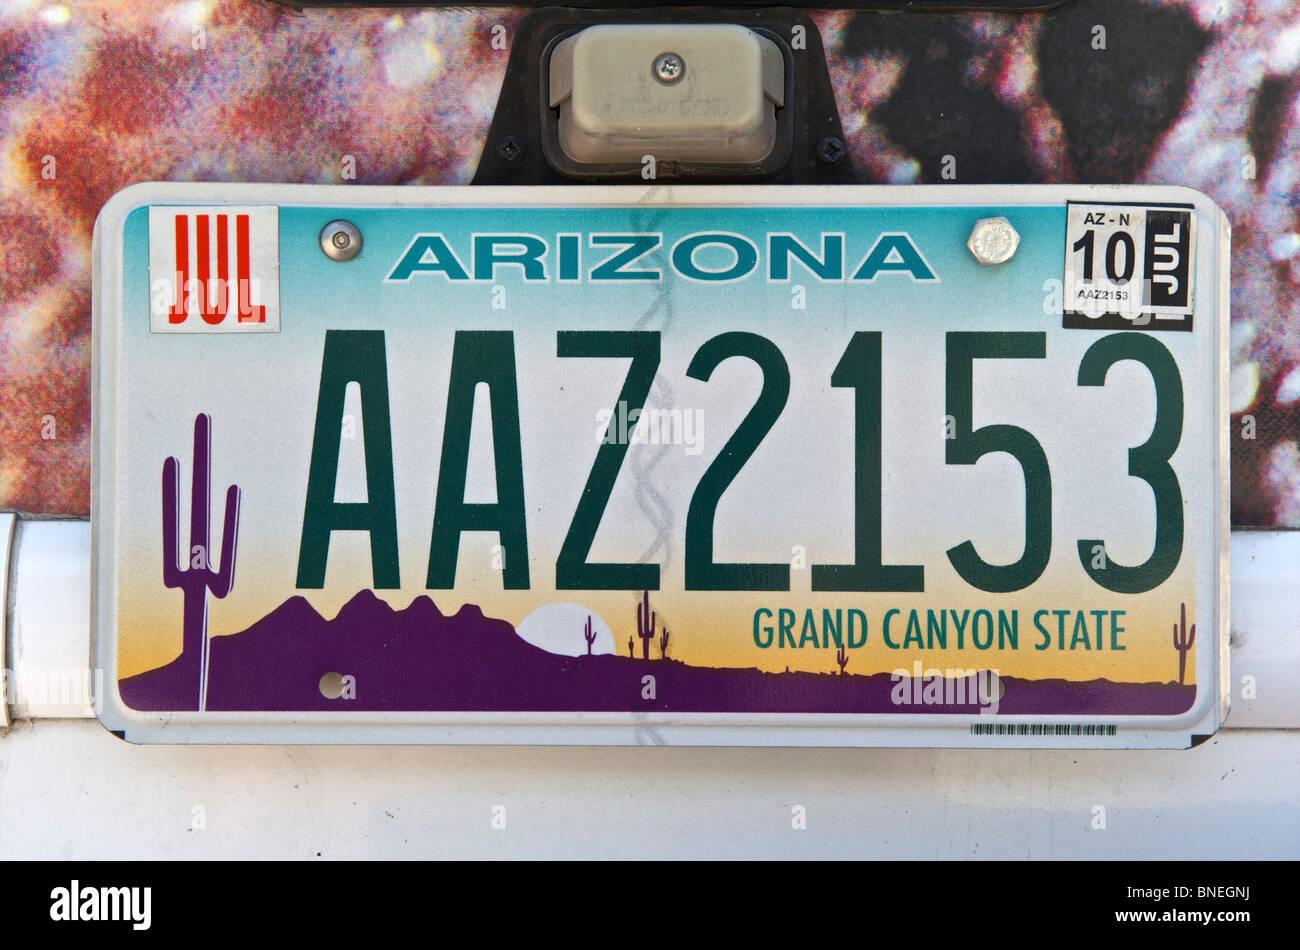 Grand Canyon State Stockfotos & Grand Canyon State Bilder - Alamy